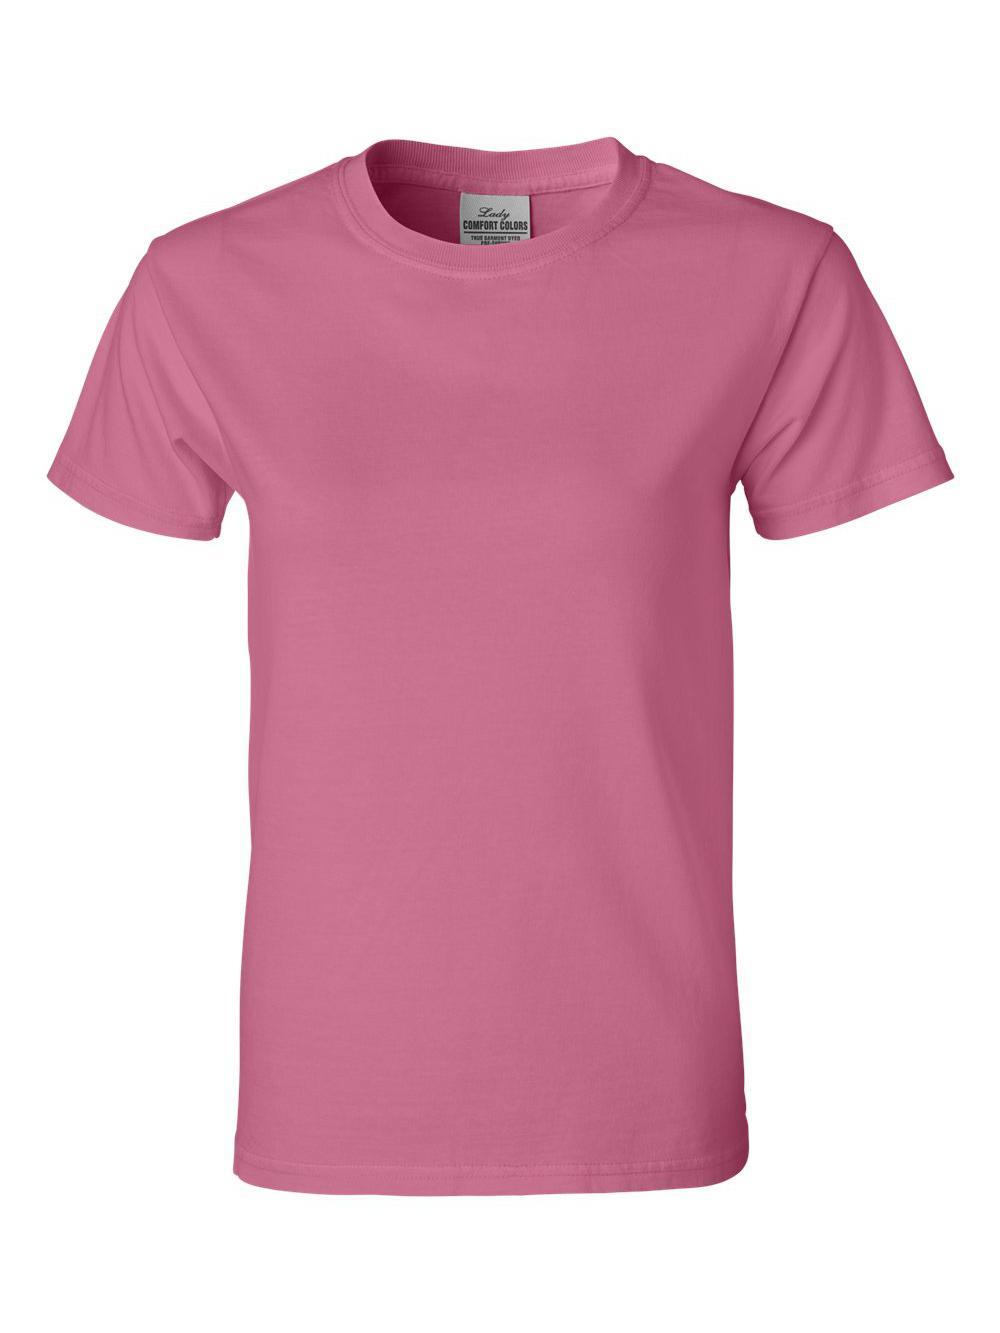 Comfort-Colors-Pigment-Dyed-Ringspun-Women-039-s-Short-Sleeve-T-Shirt-3333 thumbnail 14